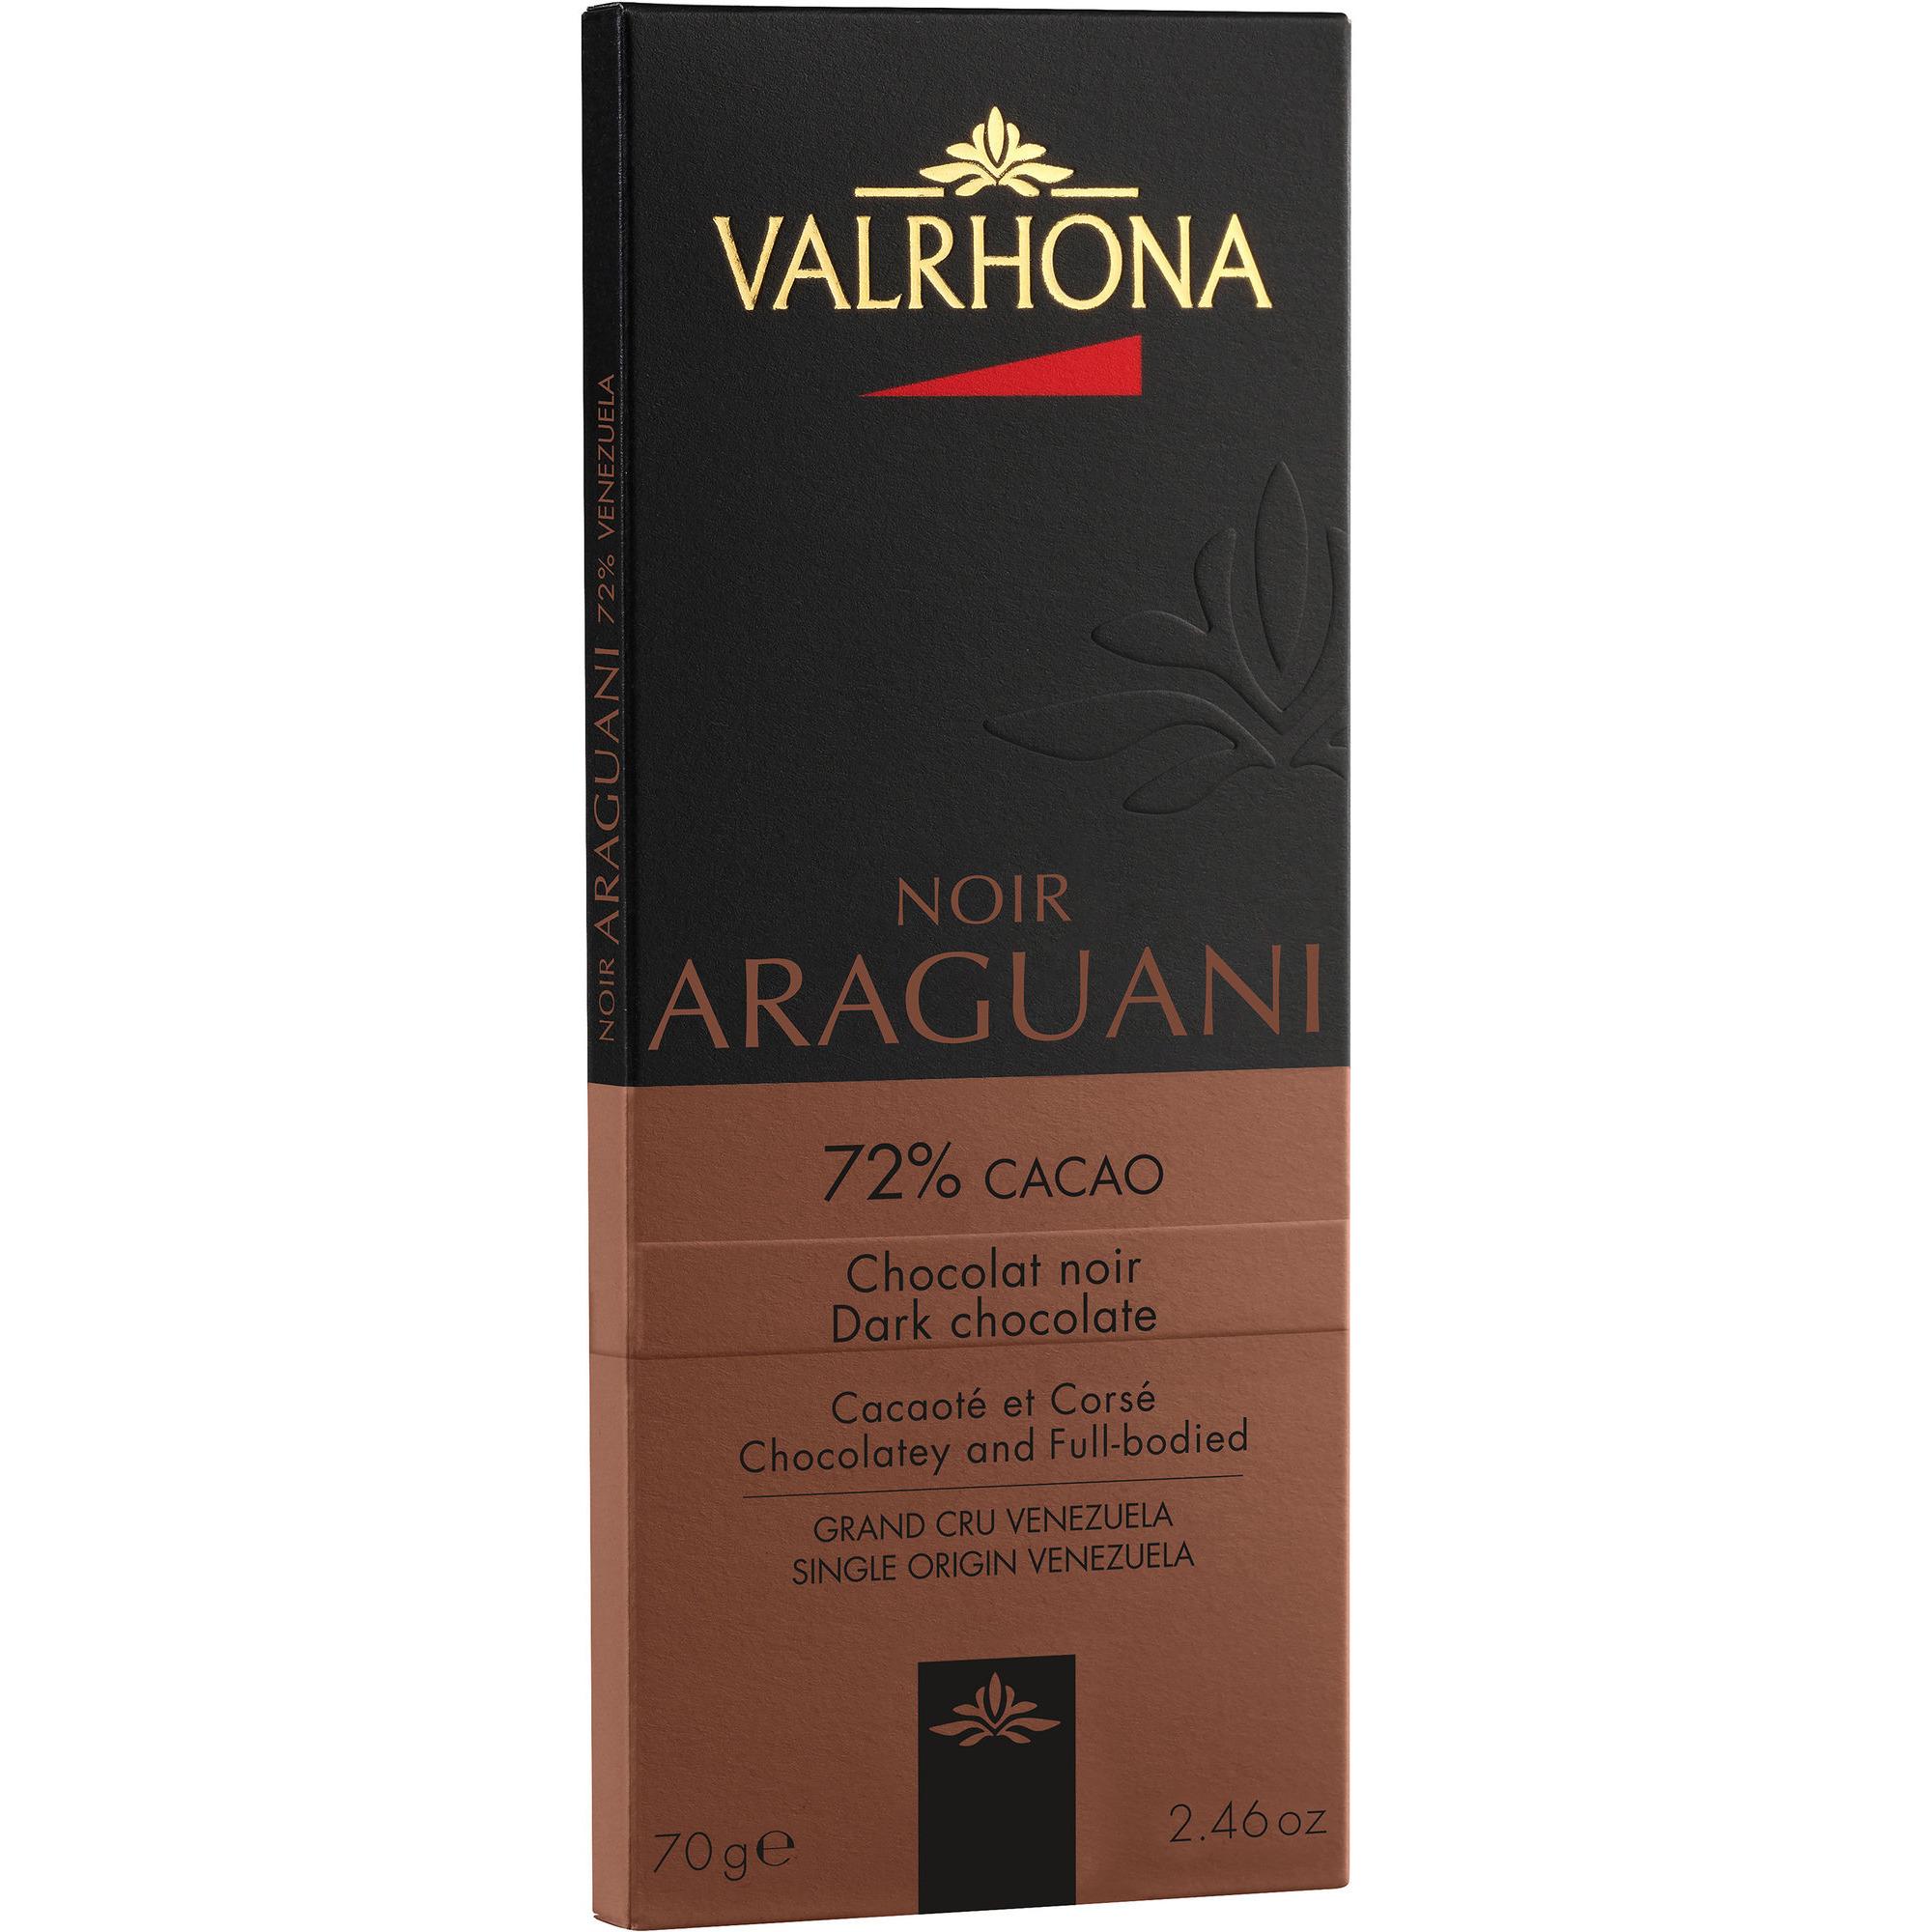 Valrhona Araguani 72% 70 g